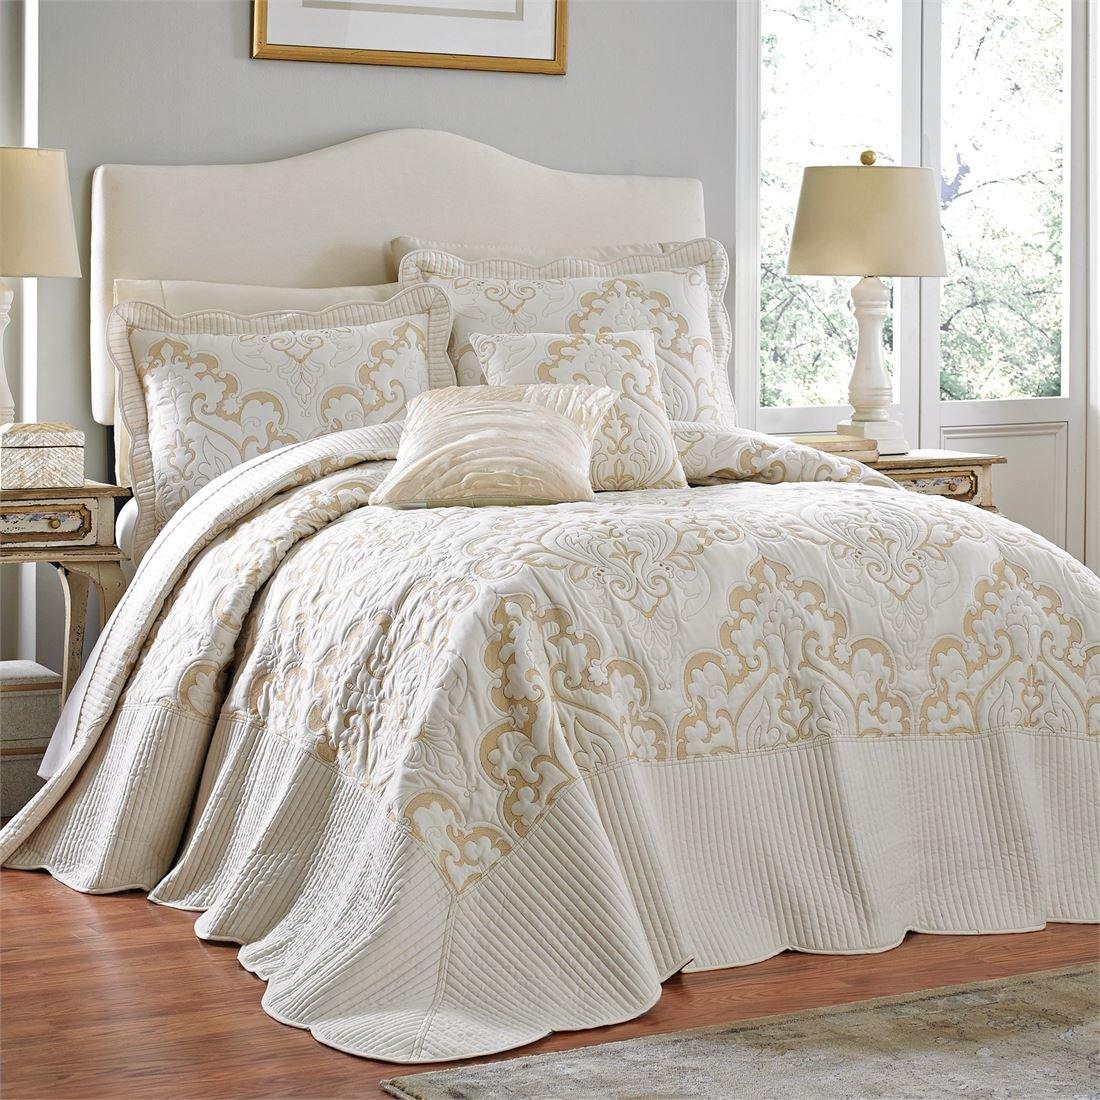 BrylaneHome Amelia Bedspread (Ivory,Twin)